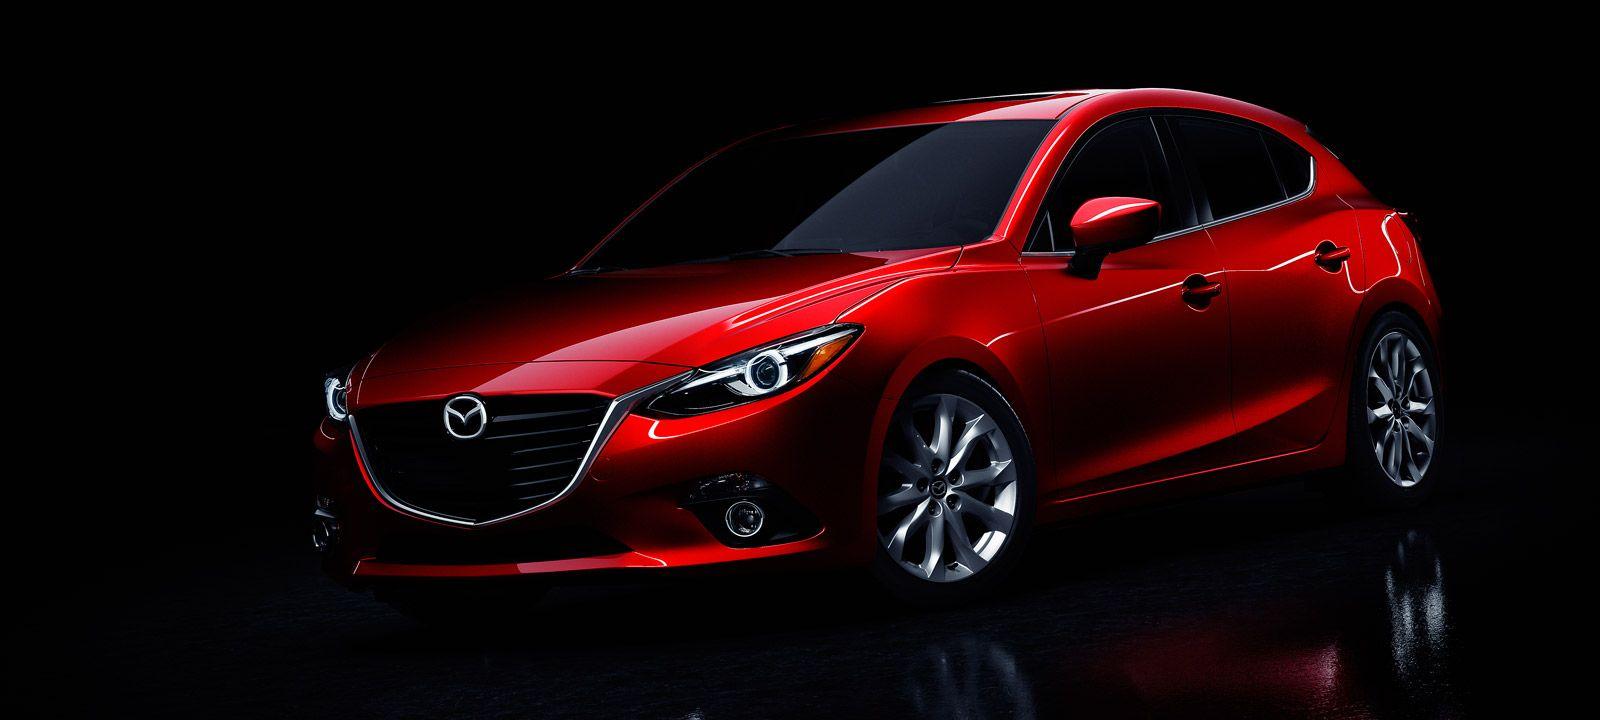 2014 Mazda3 Hatchback Mazda 3 Hatchback Mazda Cars Mazda